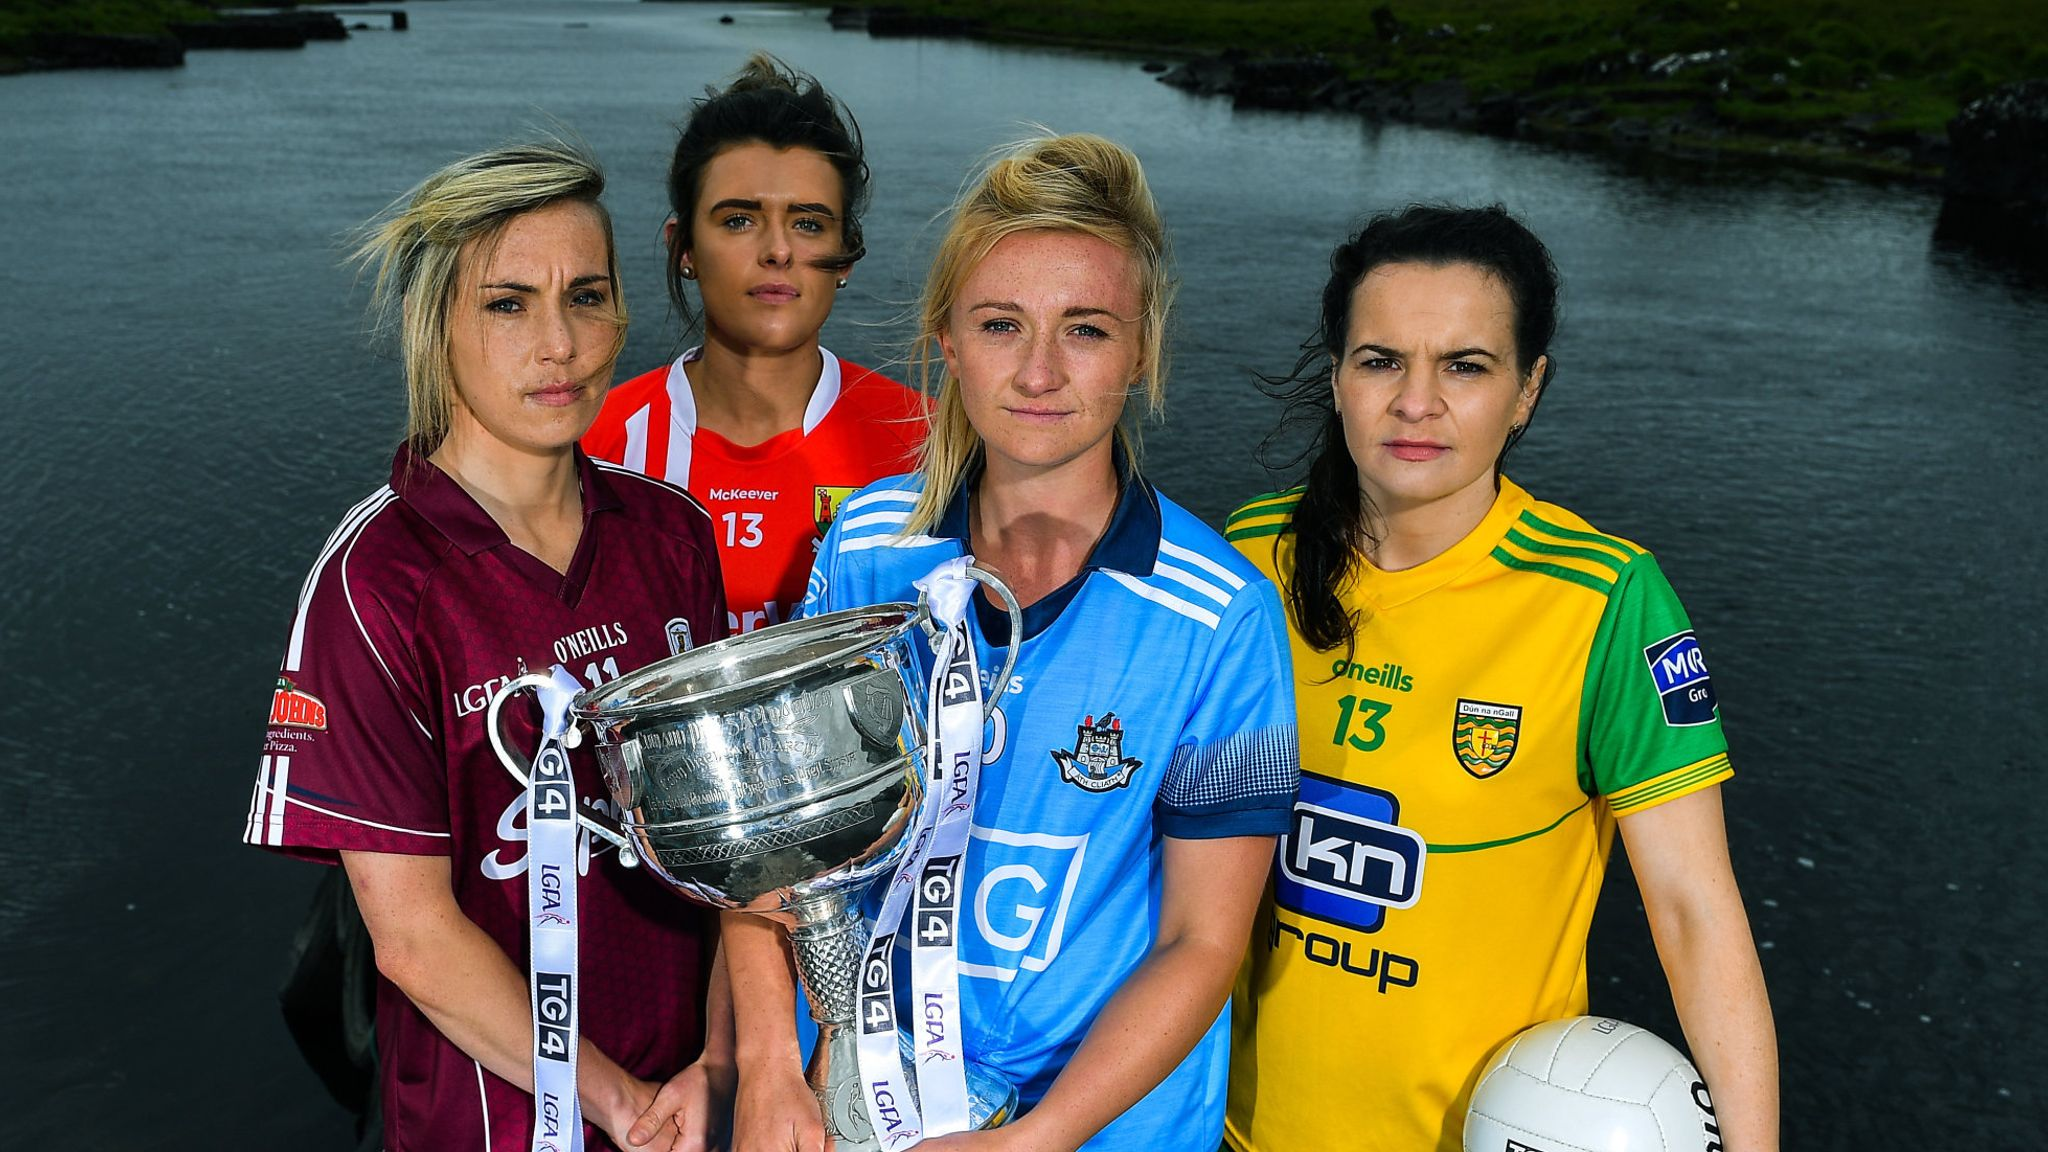 Leinster ladies gaa championship betting bitcoins paypal uk